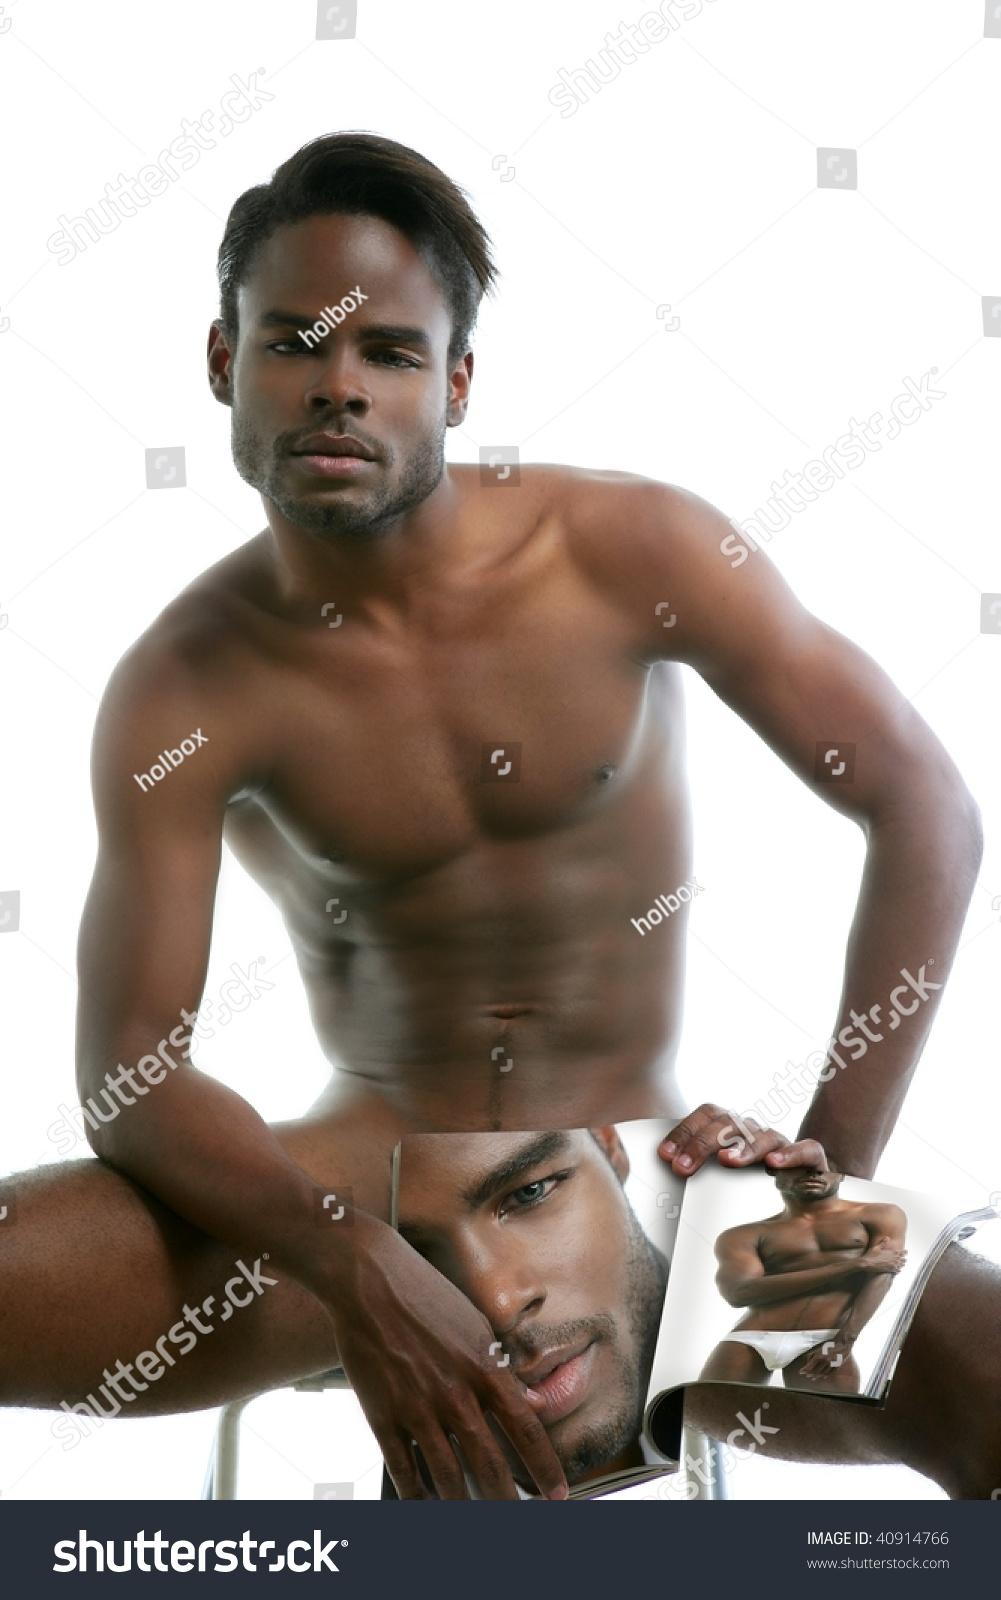 Free amature porn pic